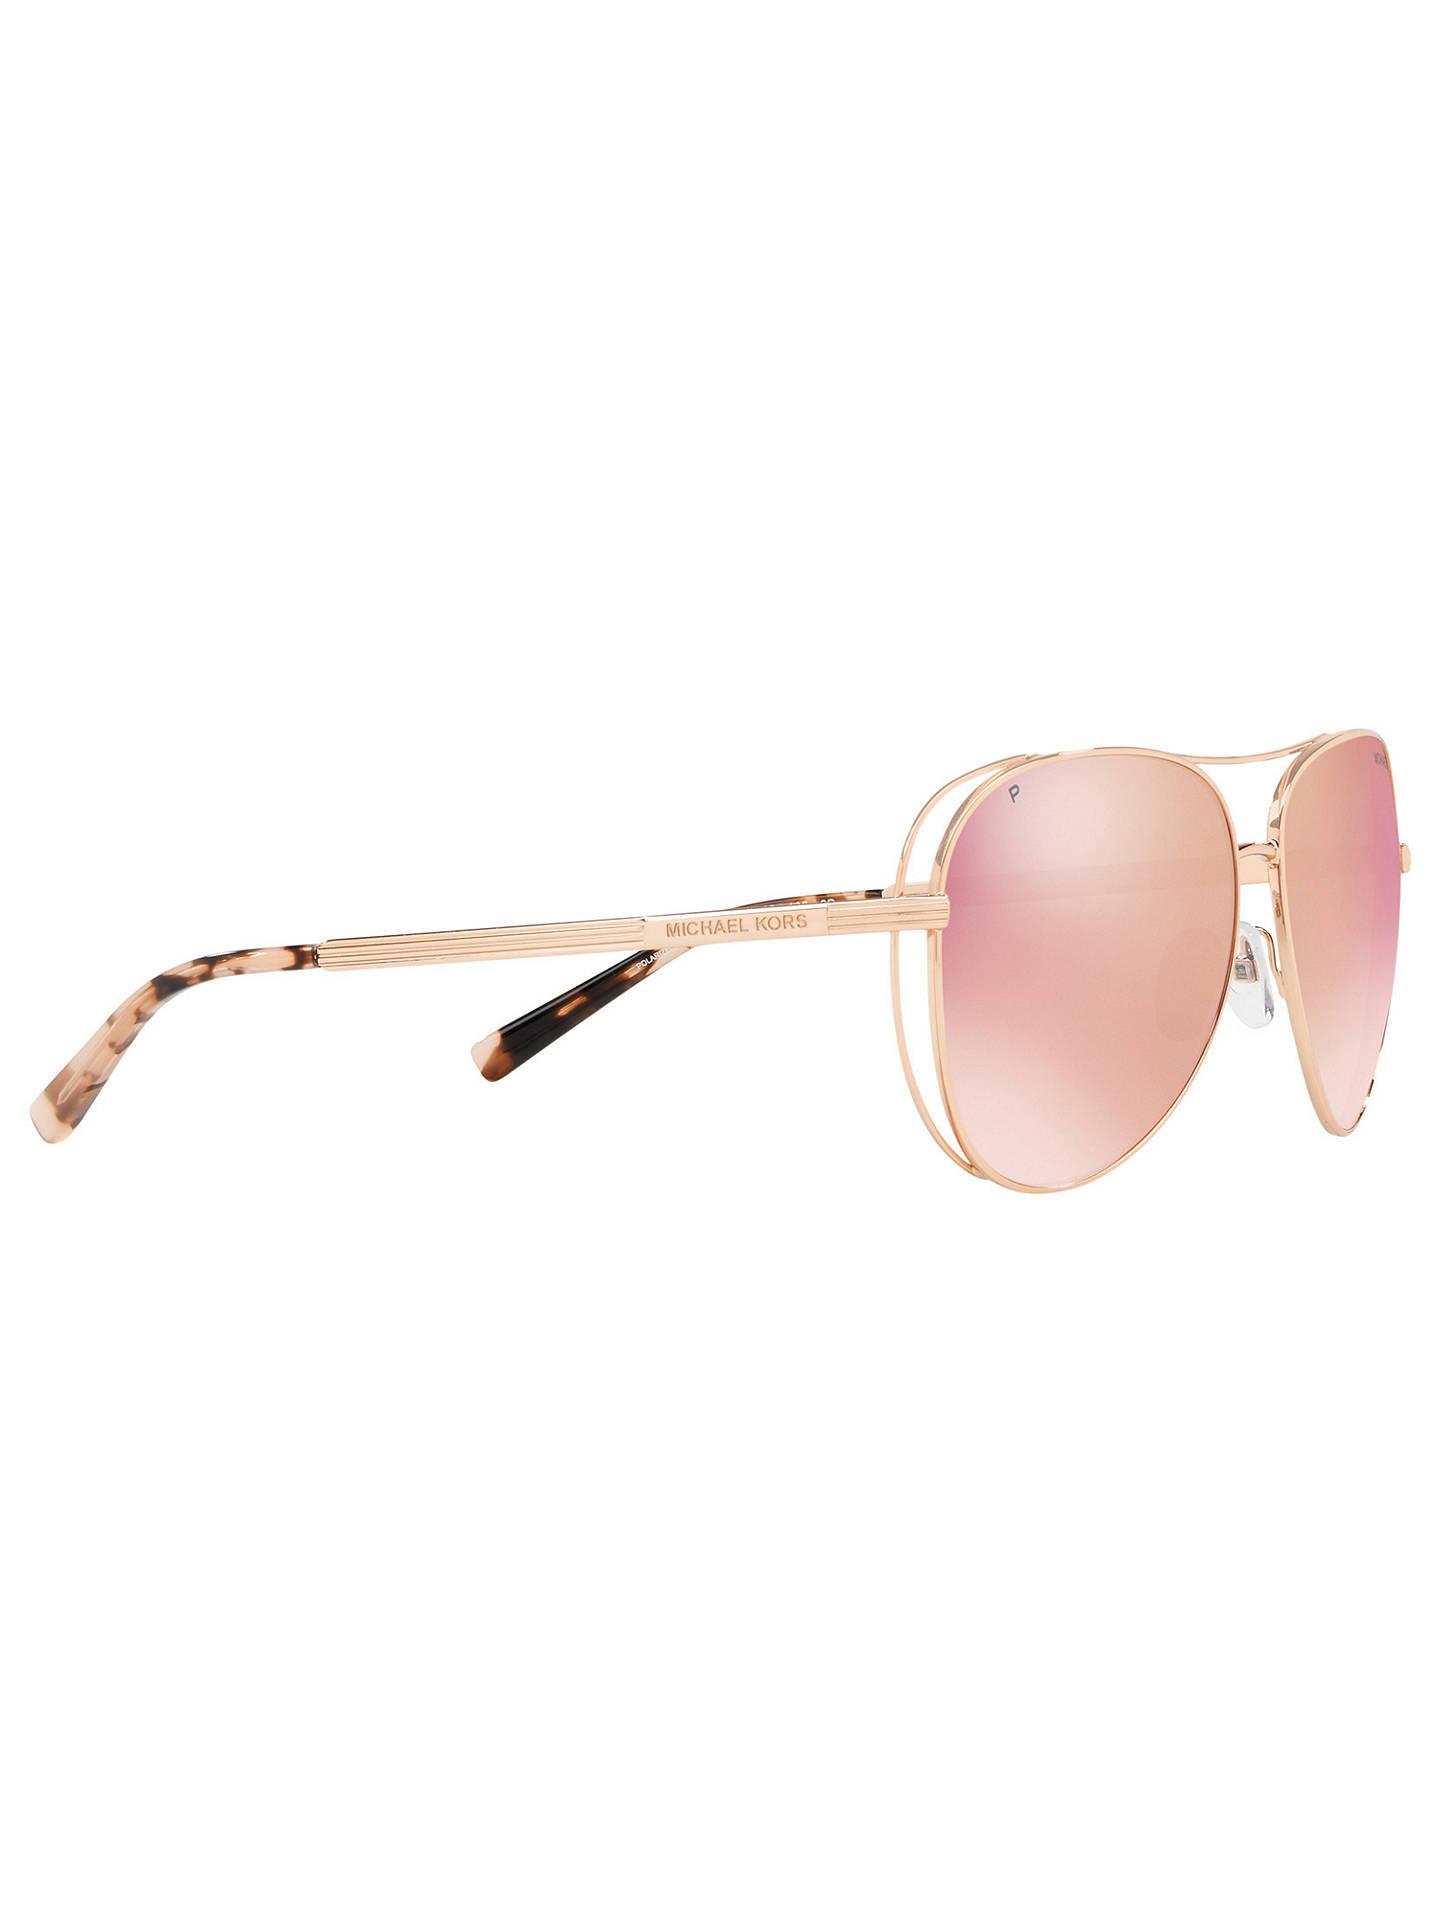 584b194873 ... BuyMichael Kors MK1024 Women s Lai Polarised Aviator Sunglasses